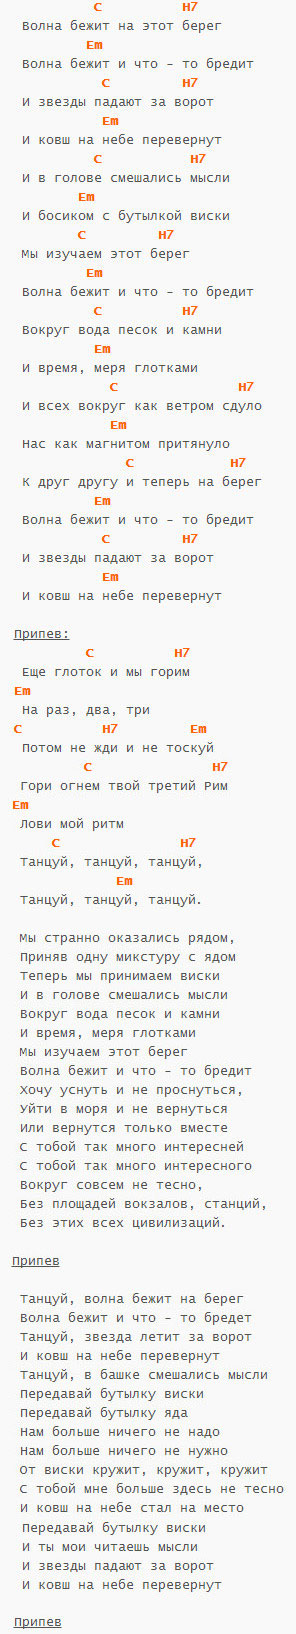 Танцуй - Сплин - Аккорды и текст